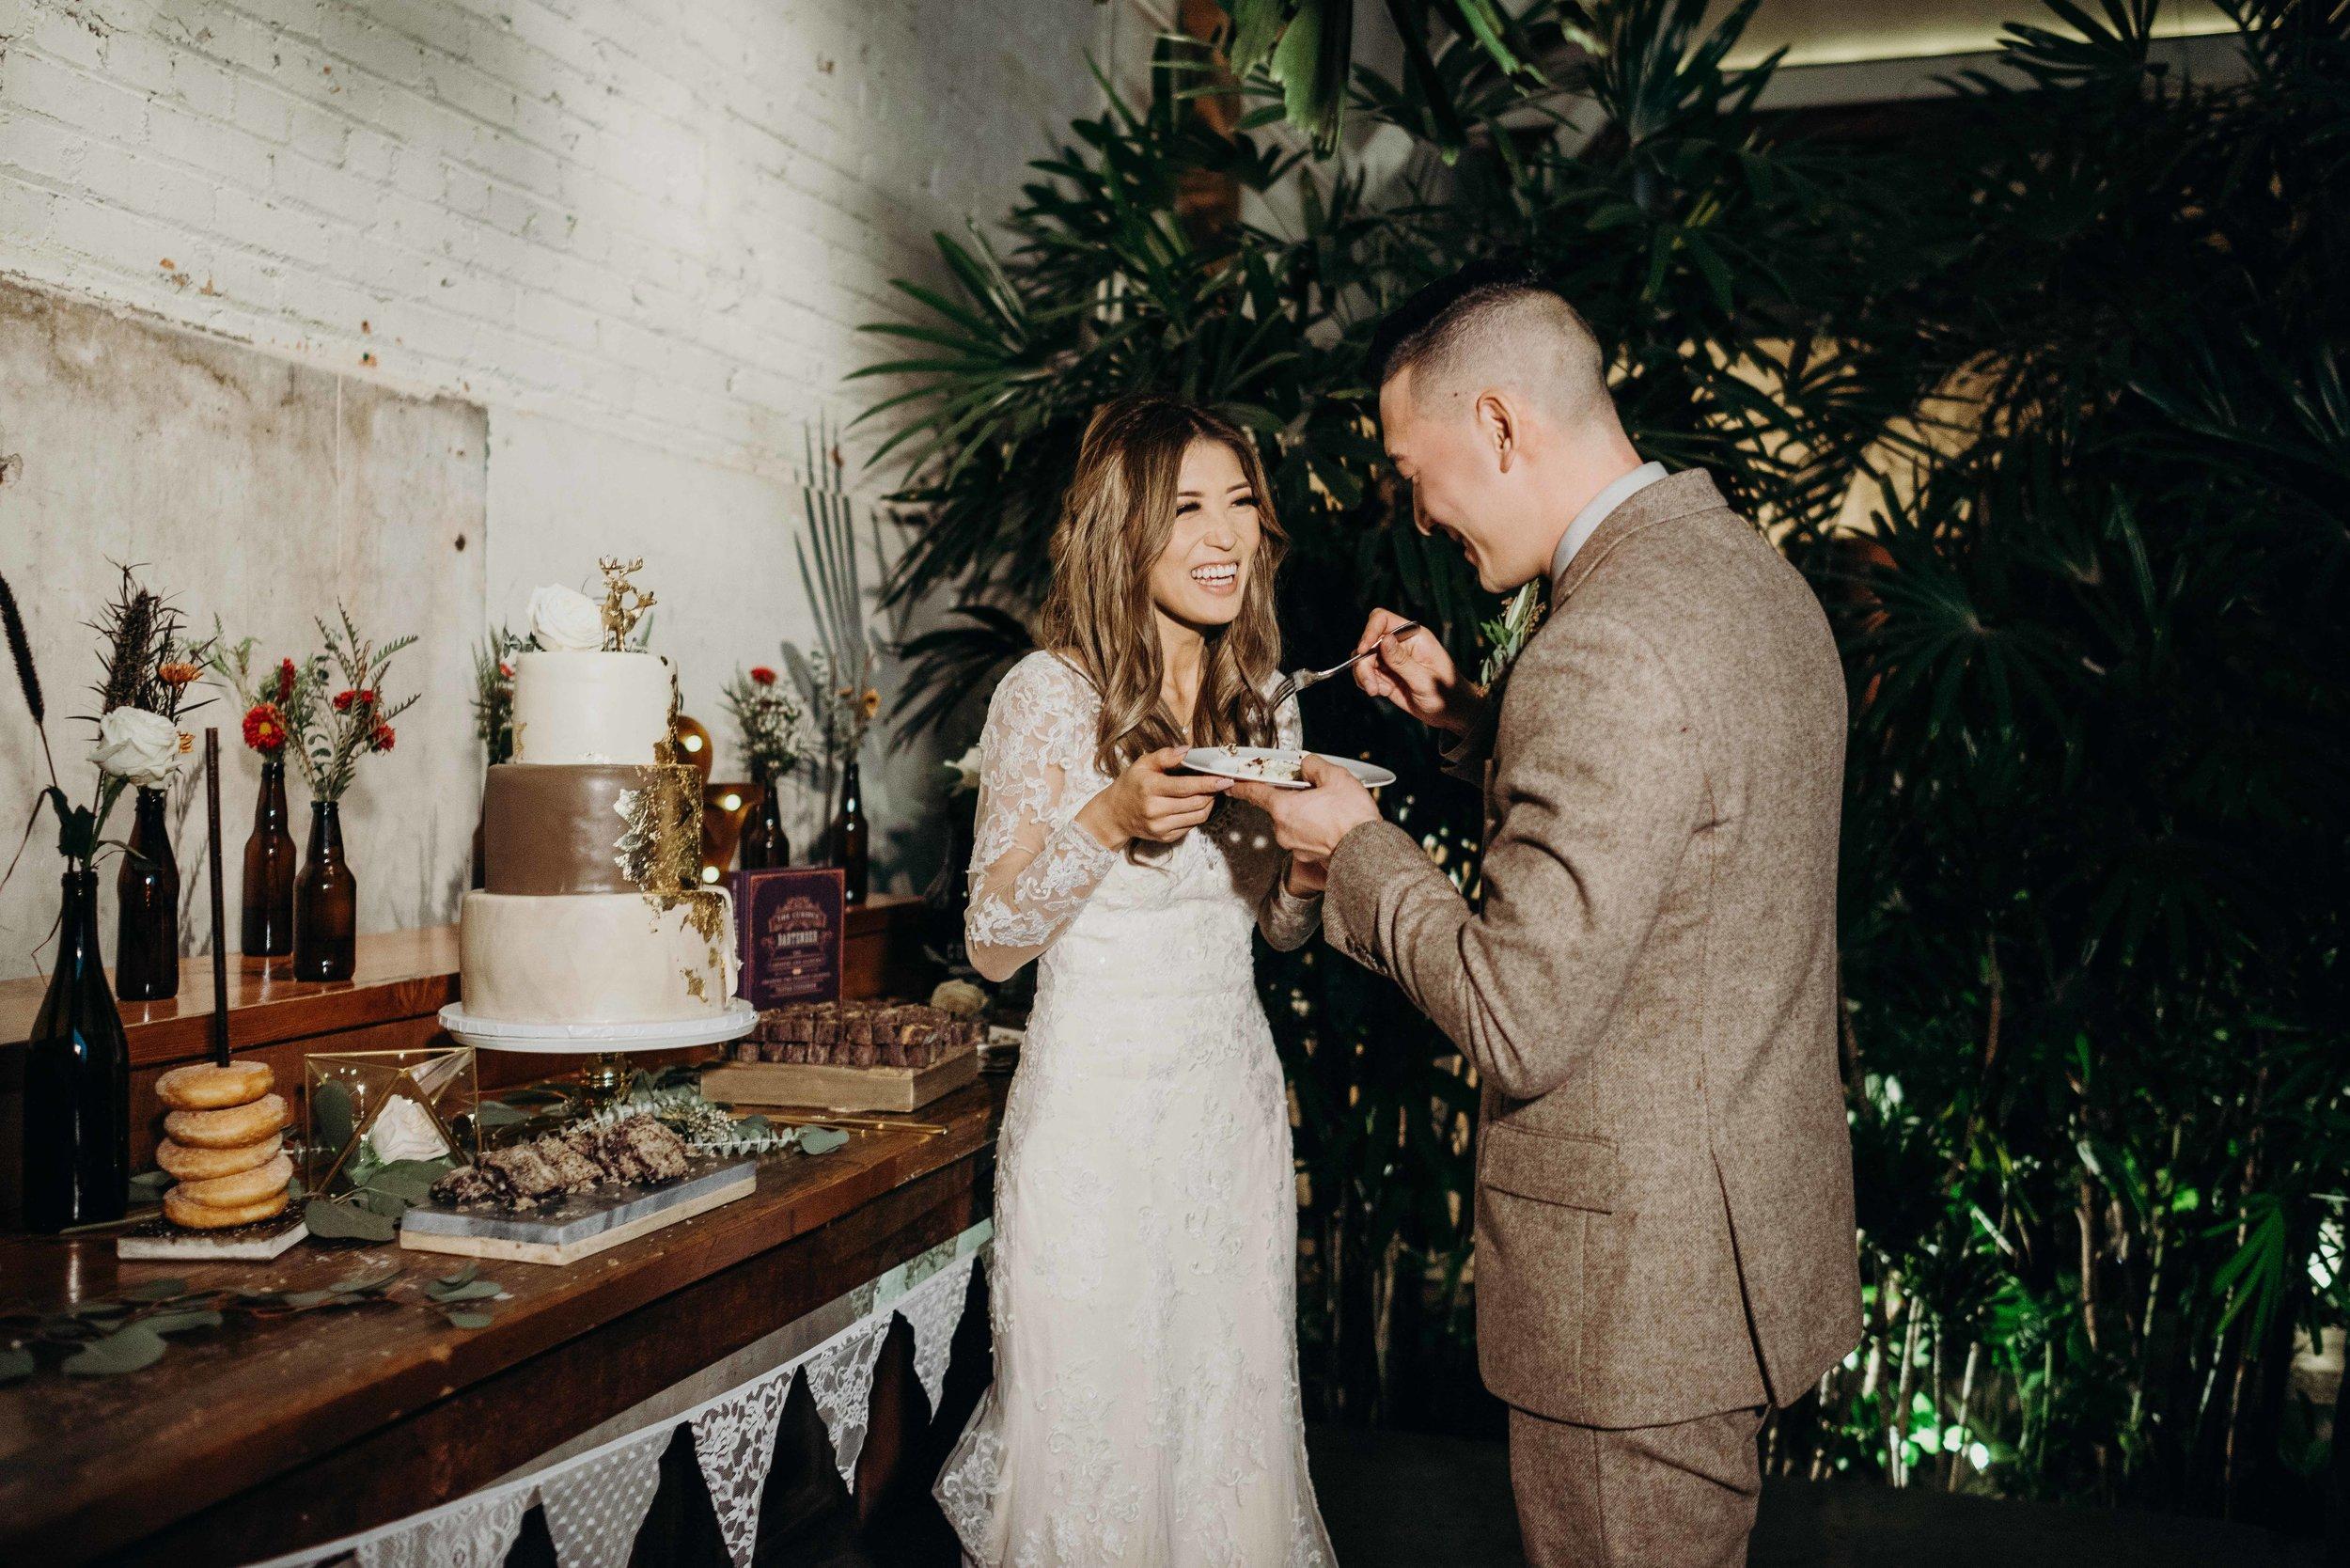 Cristina+Raymond Rd DTLA Millwick Wedding Post -_-139.jpg